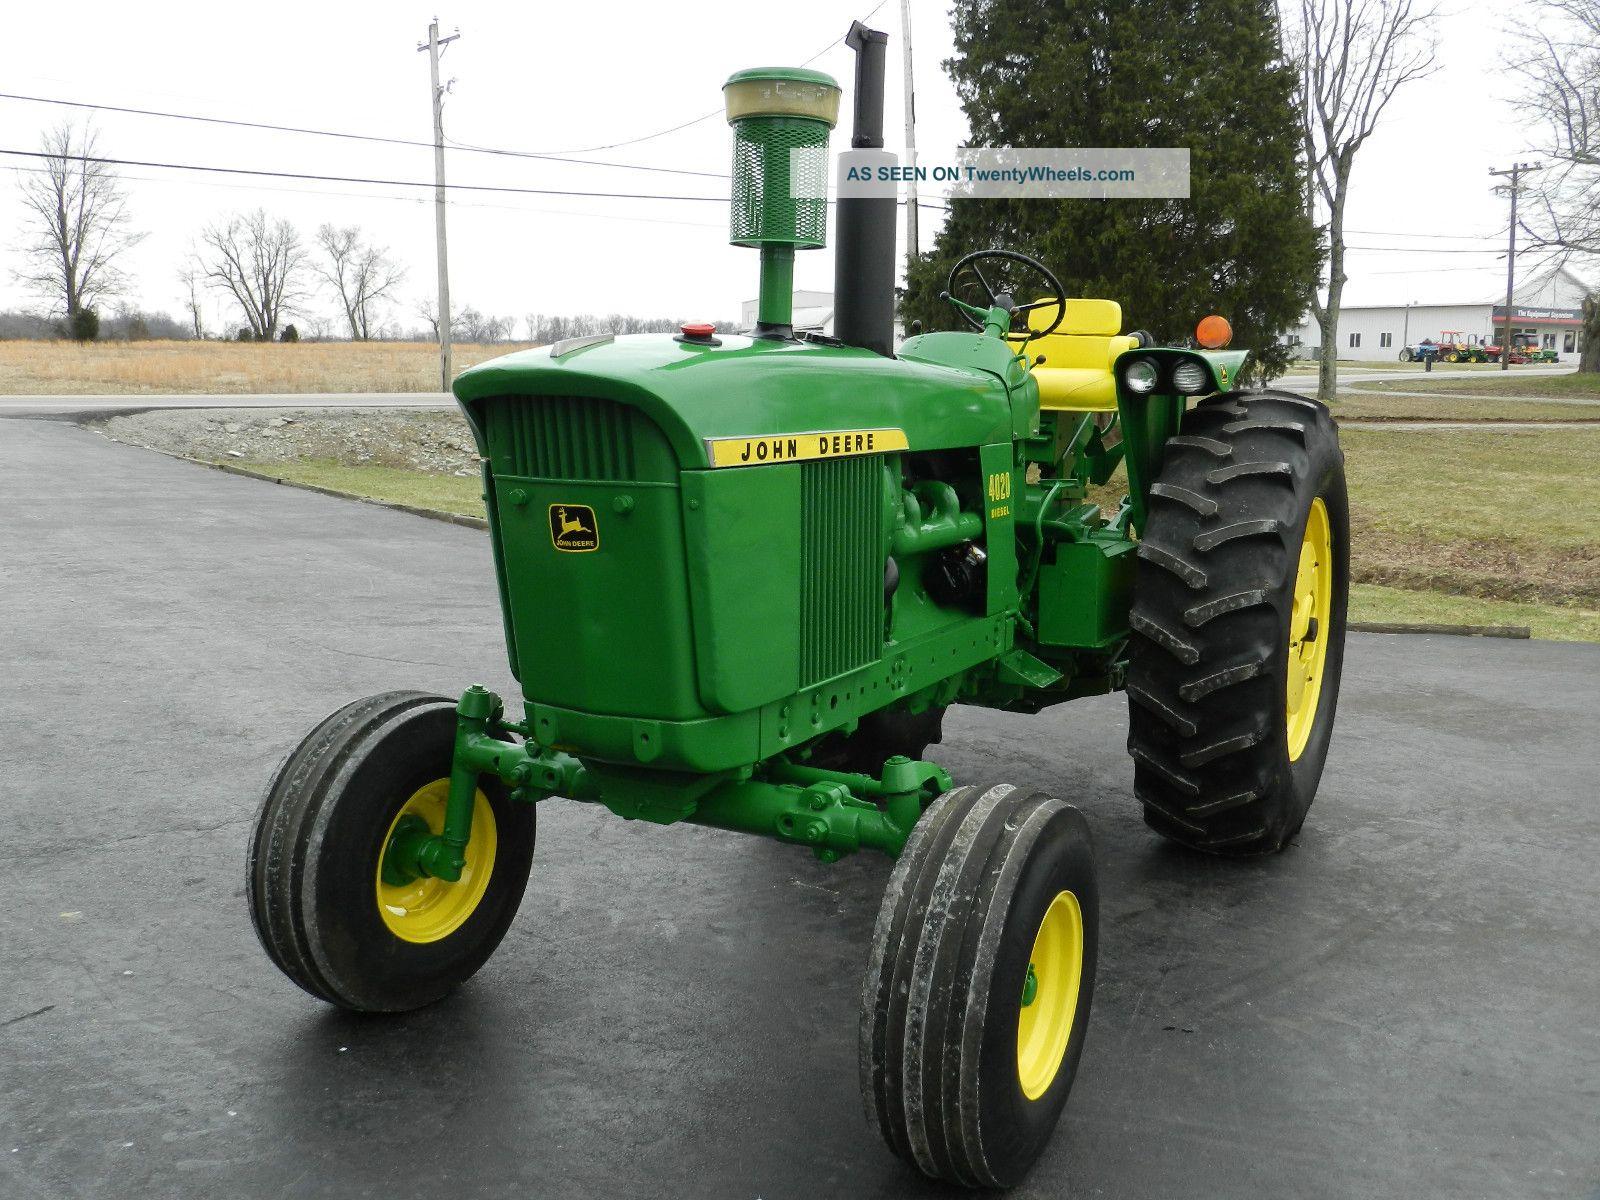 John Deere Tractor Diesel Restored Sharp Lgw